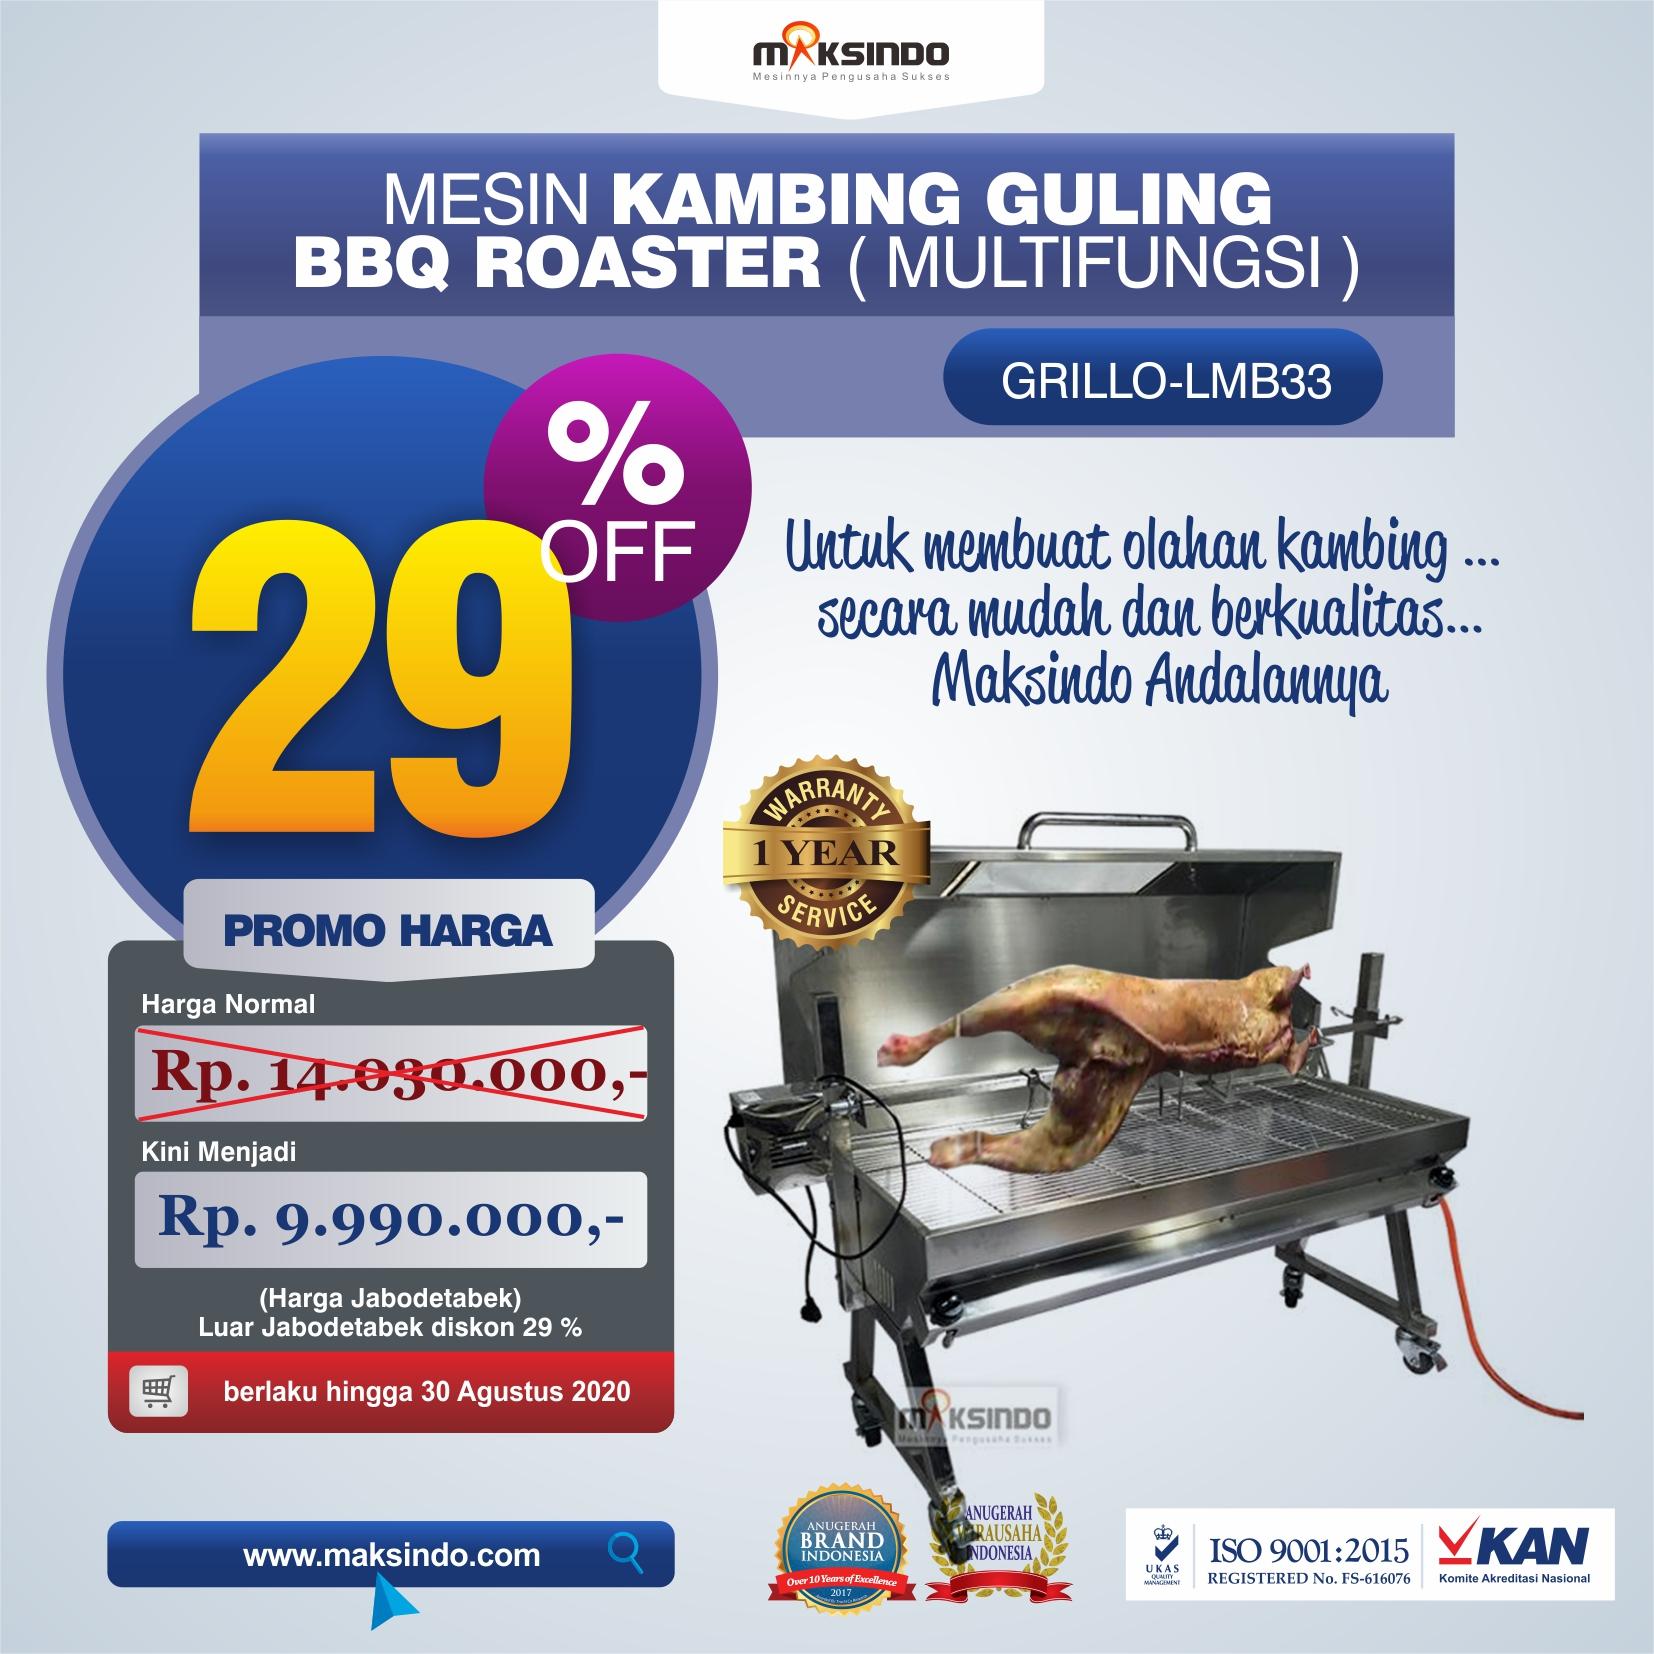 Jual Mesin Kambing Guling BBQ Roaster (GRILLO-LMB33) di Banjarmasin